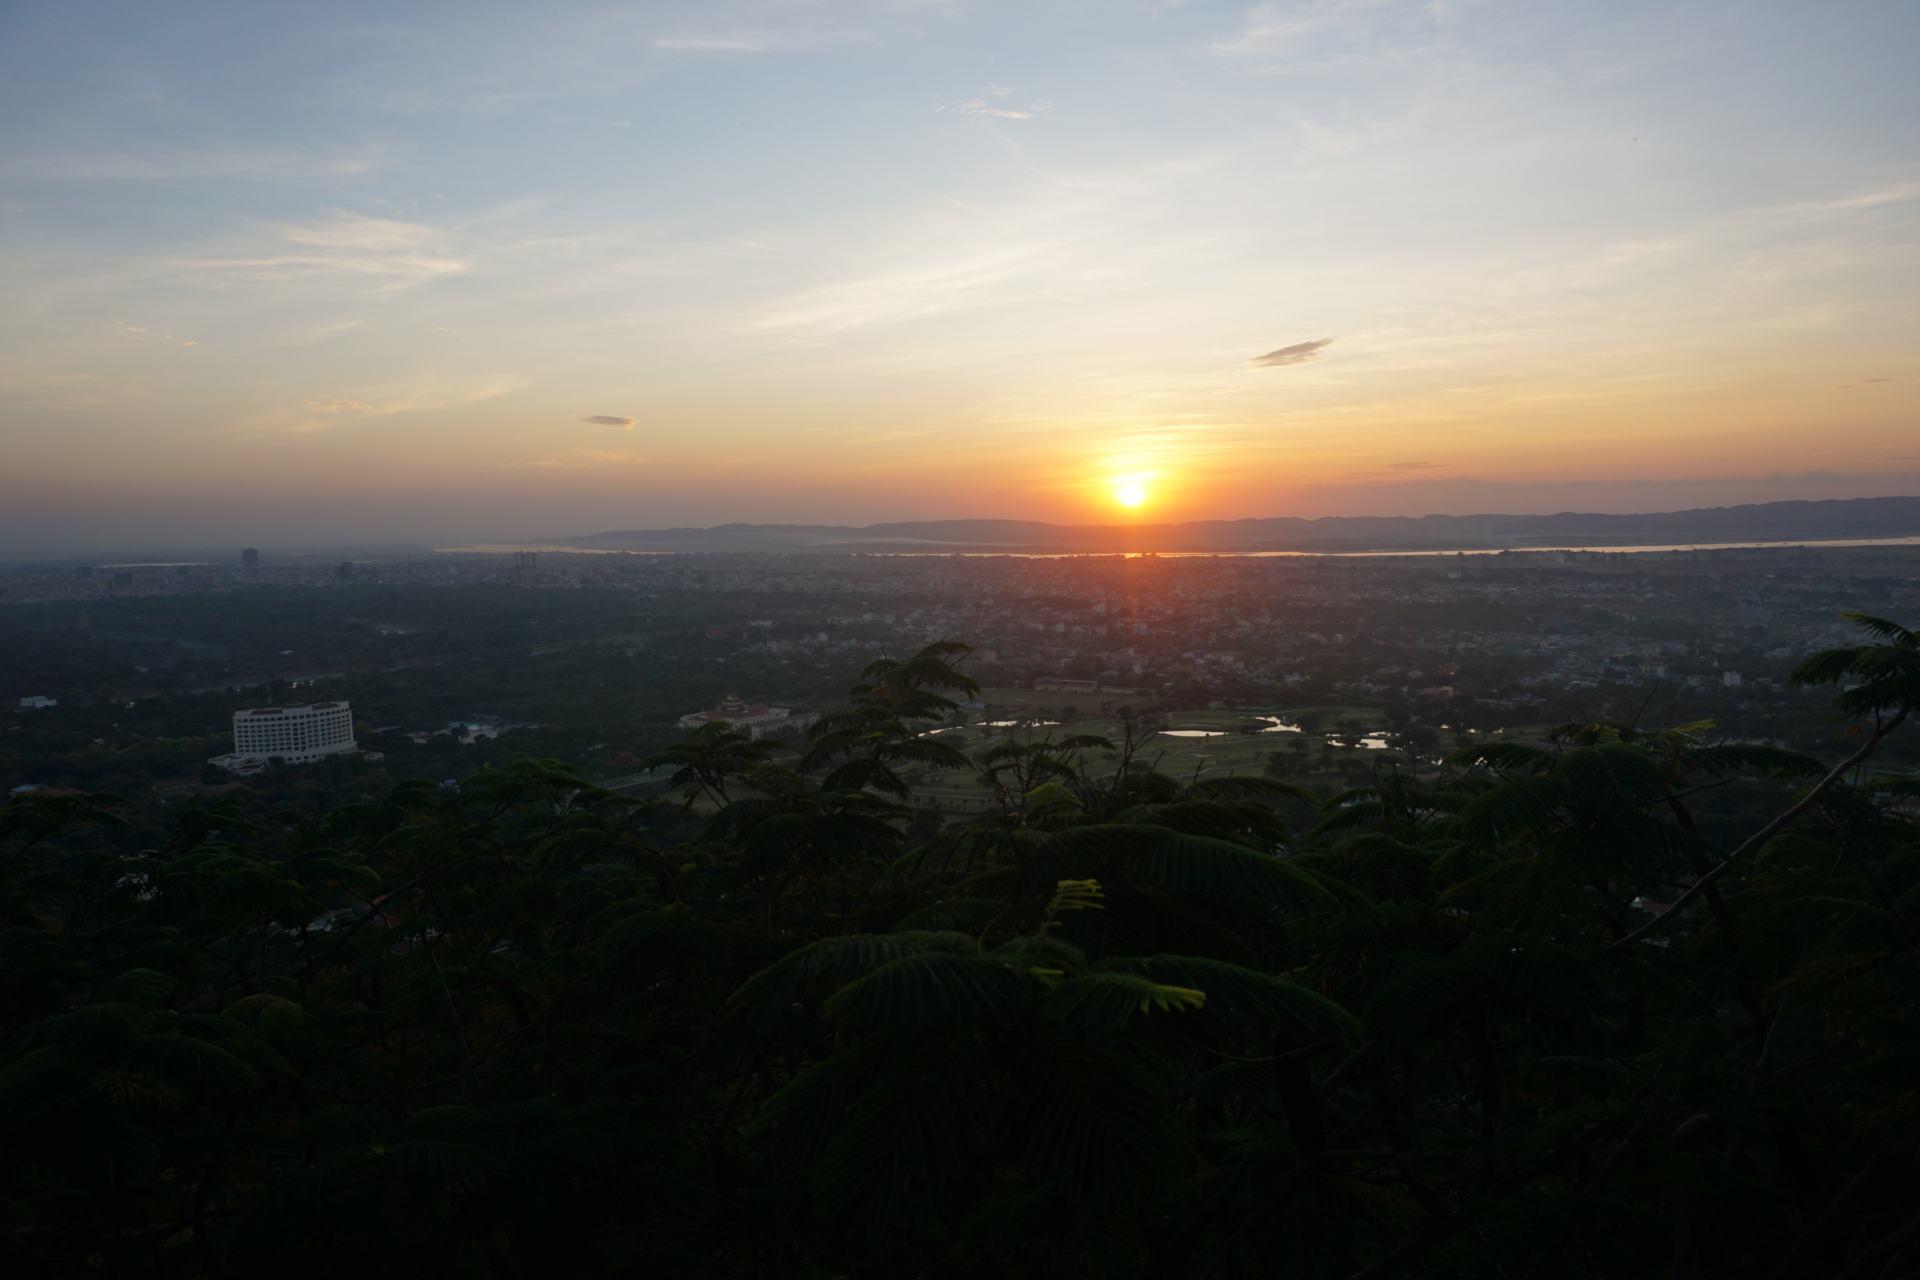 ;andalayHill Sonnenuntergang in Myanmar